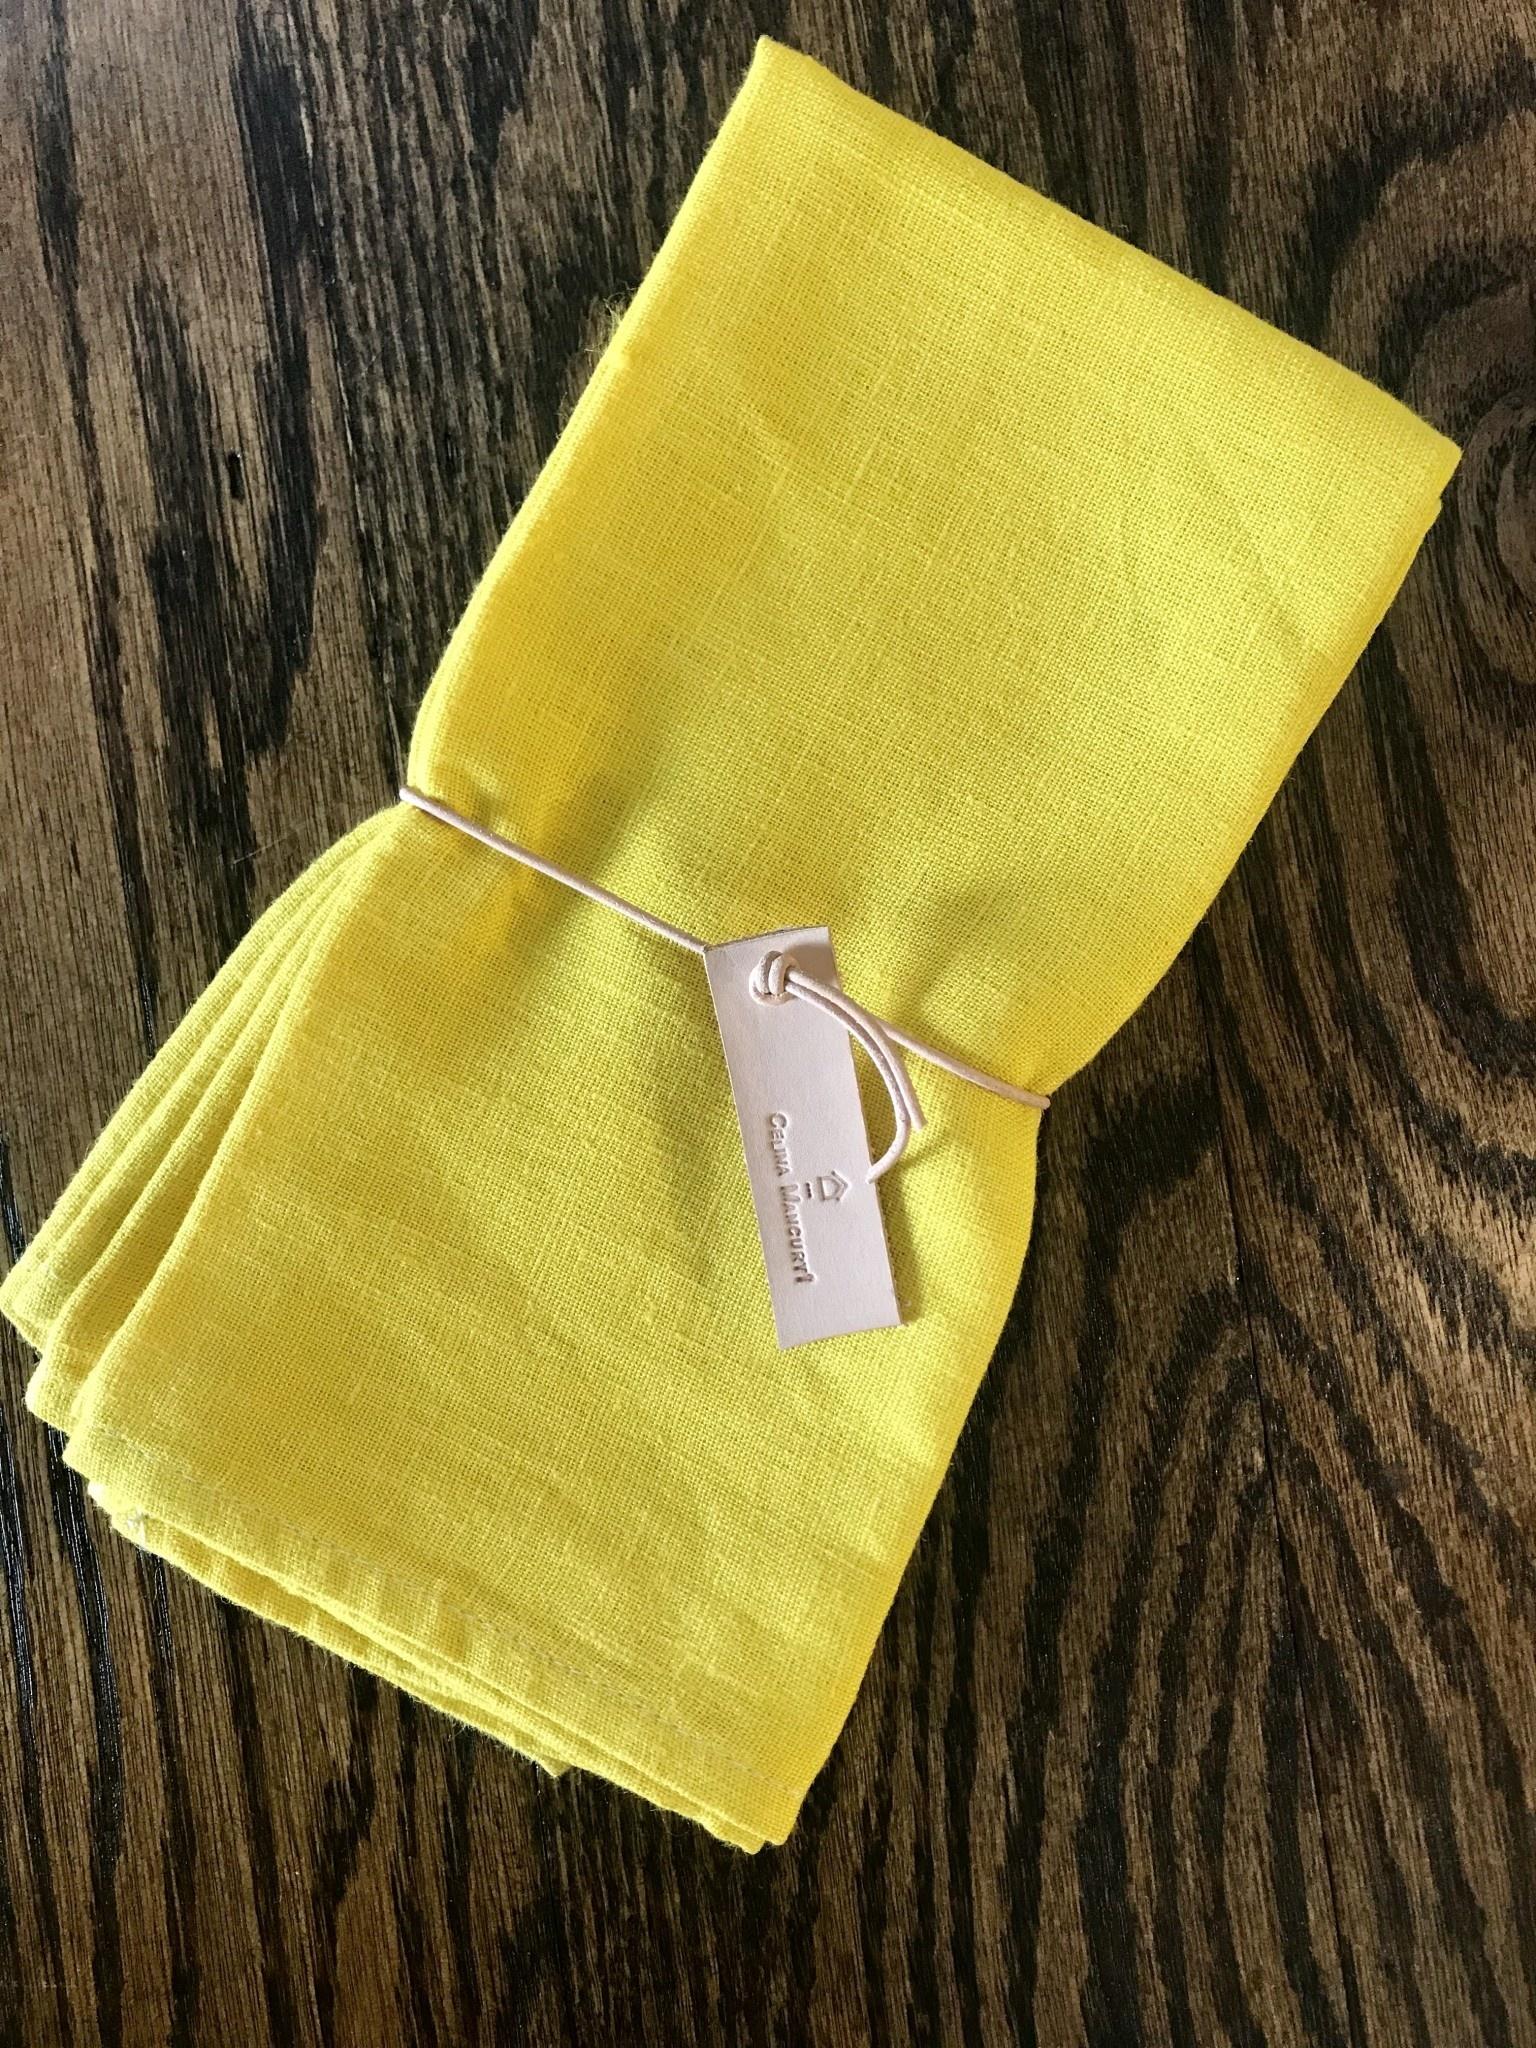 Celina Mancurti Linen Napkin Sets of 2